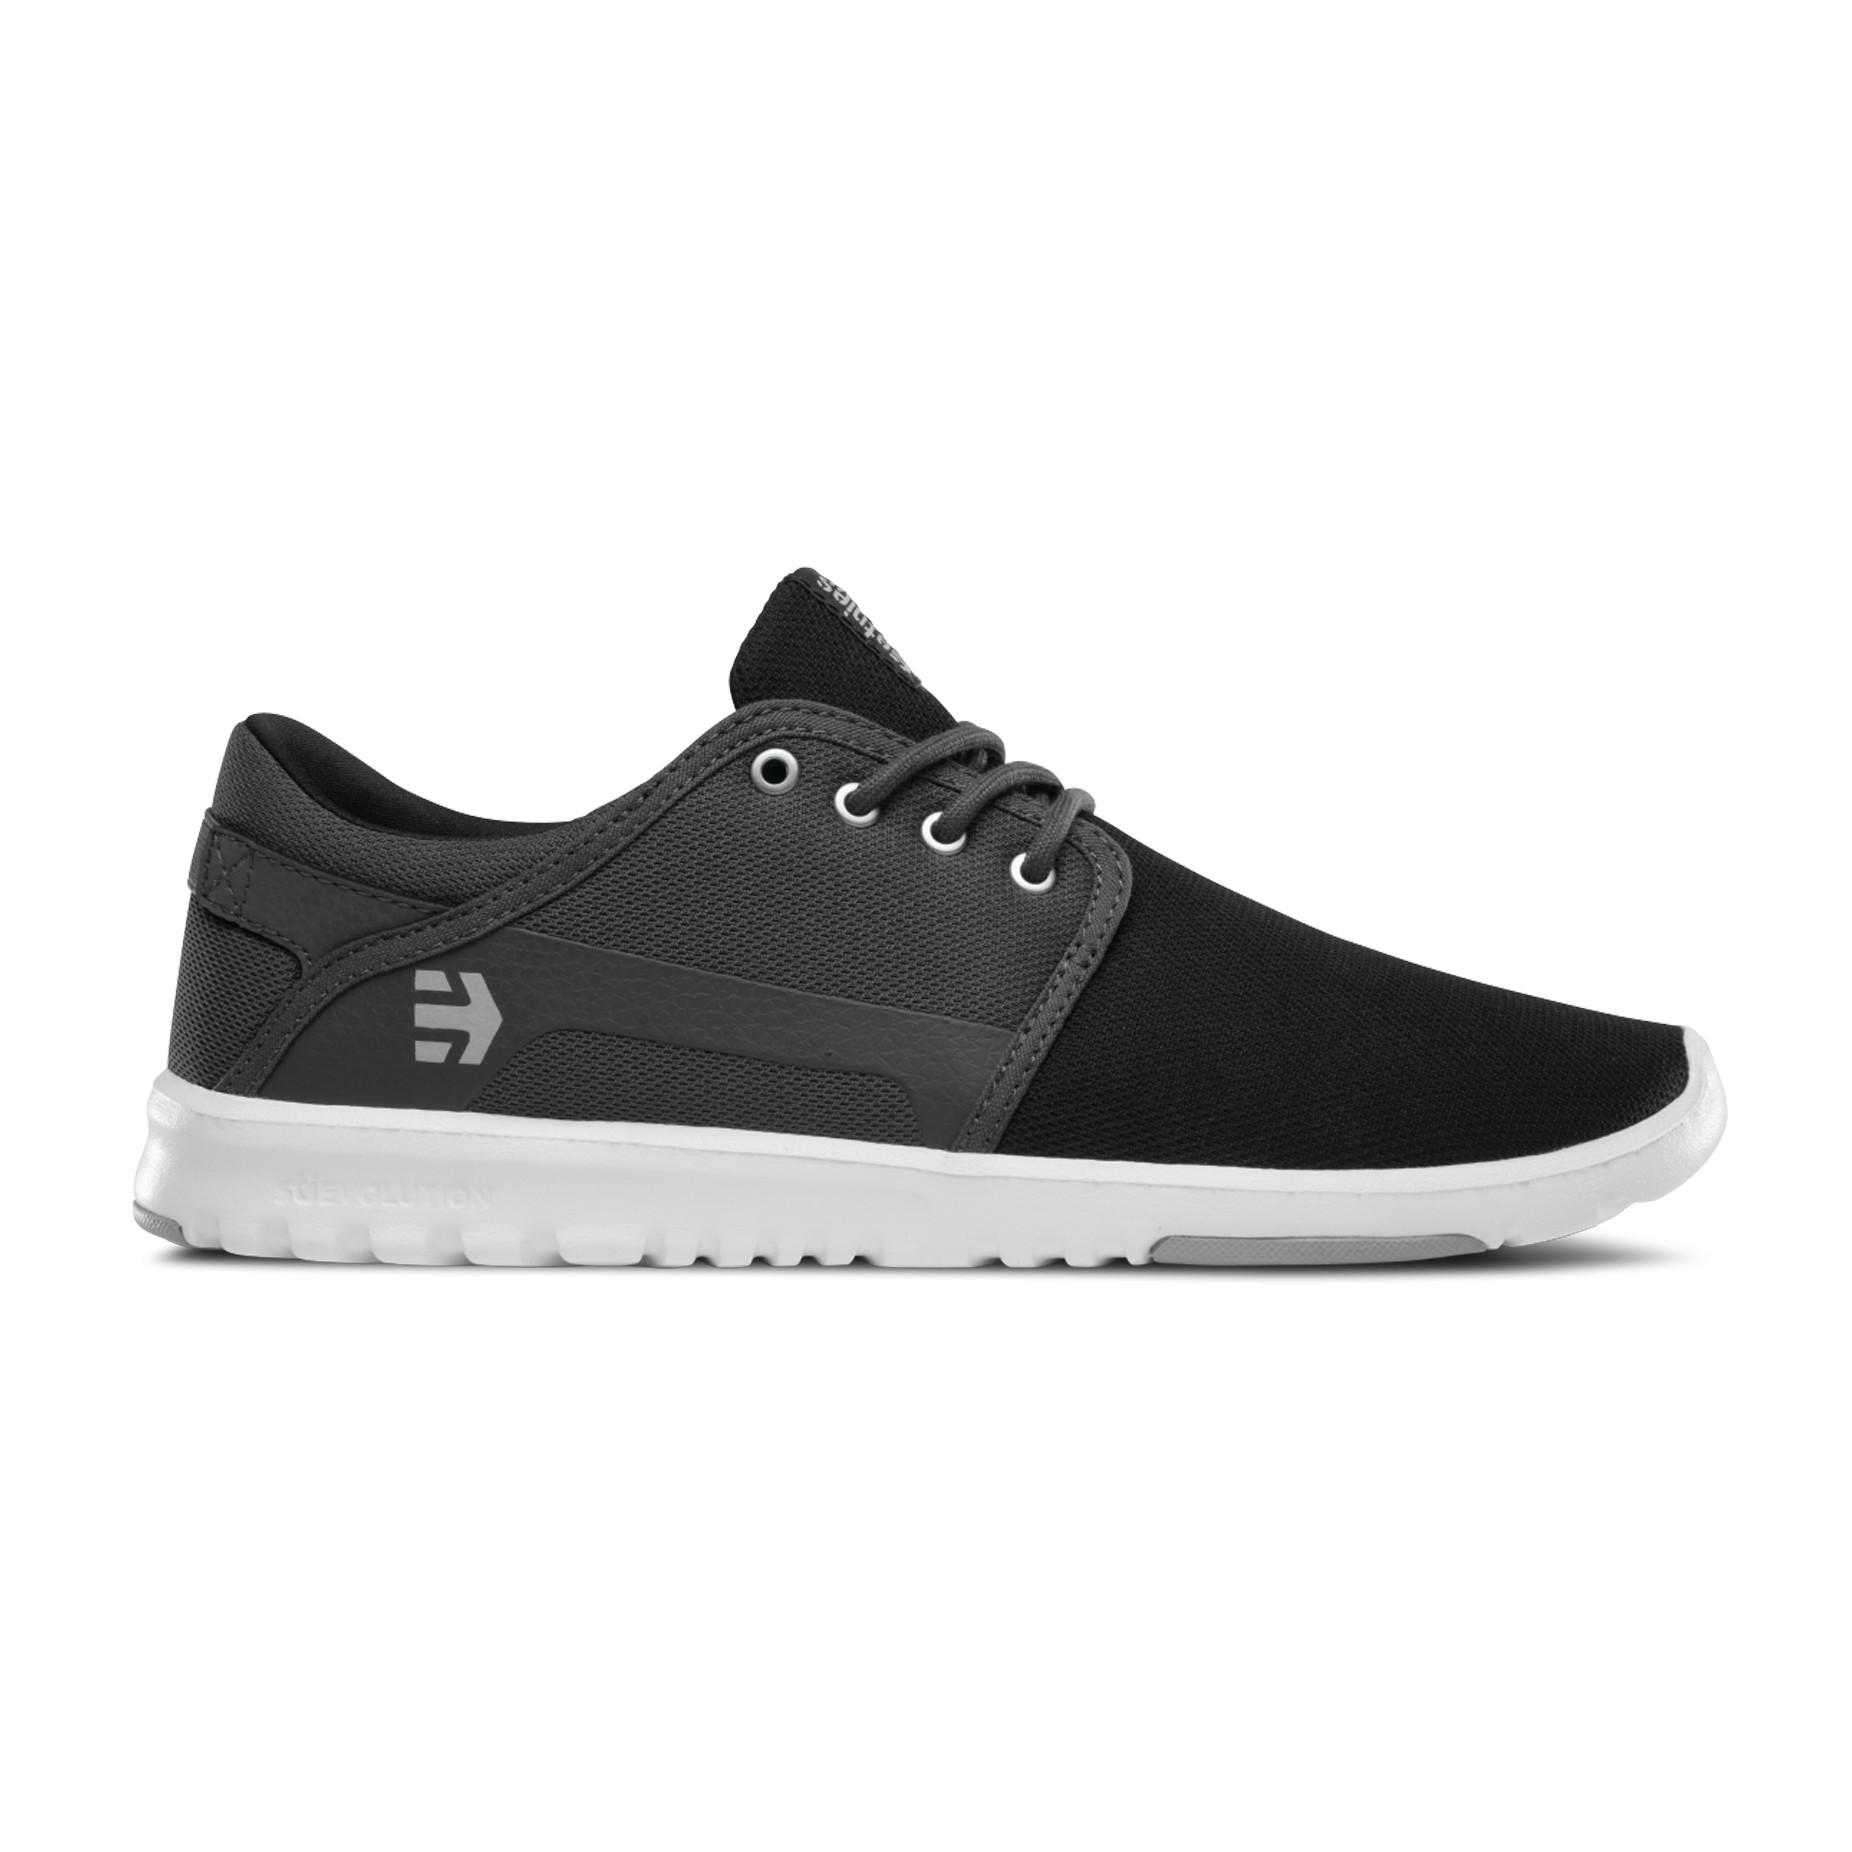 Men Etnies Scout BlackBlackBlack U88s7580T1s4415 fashion shoes break down price on sales